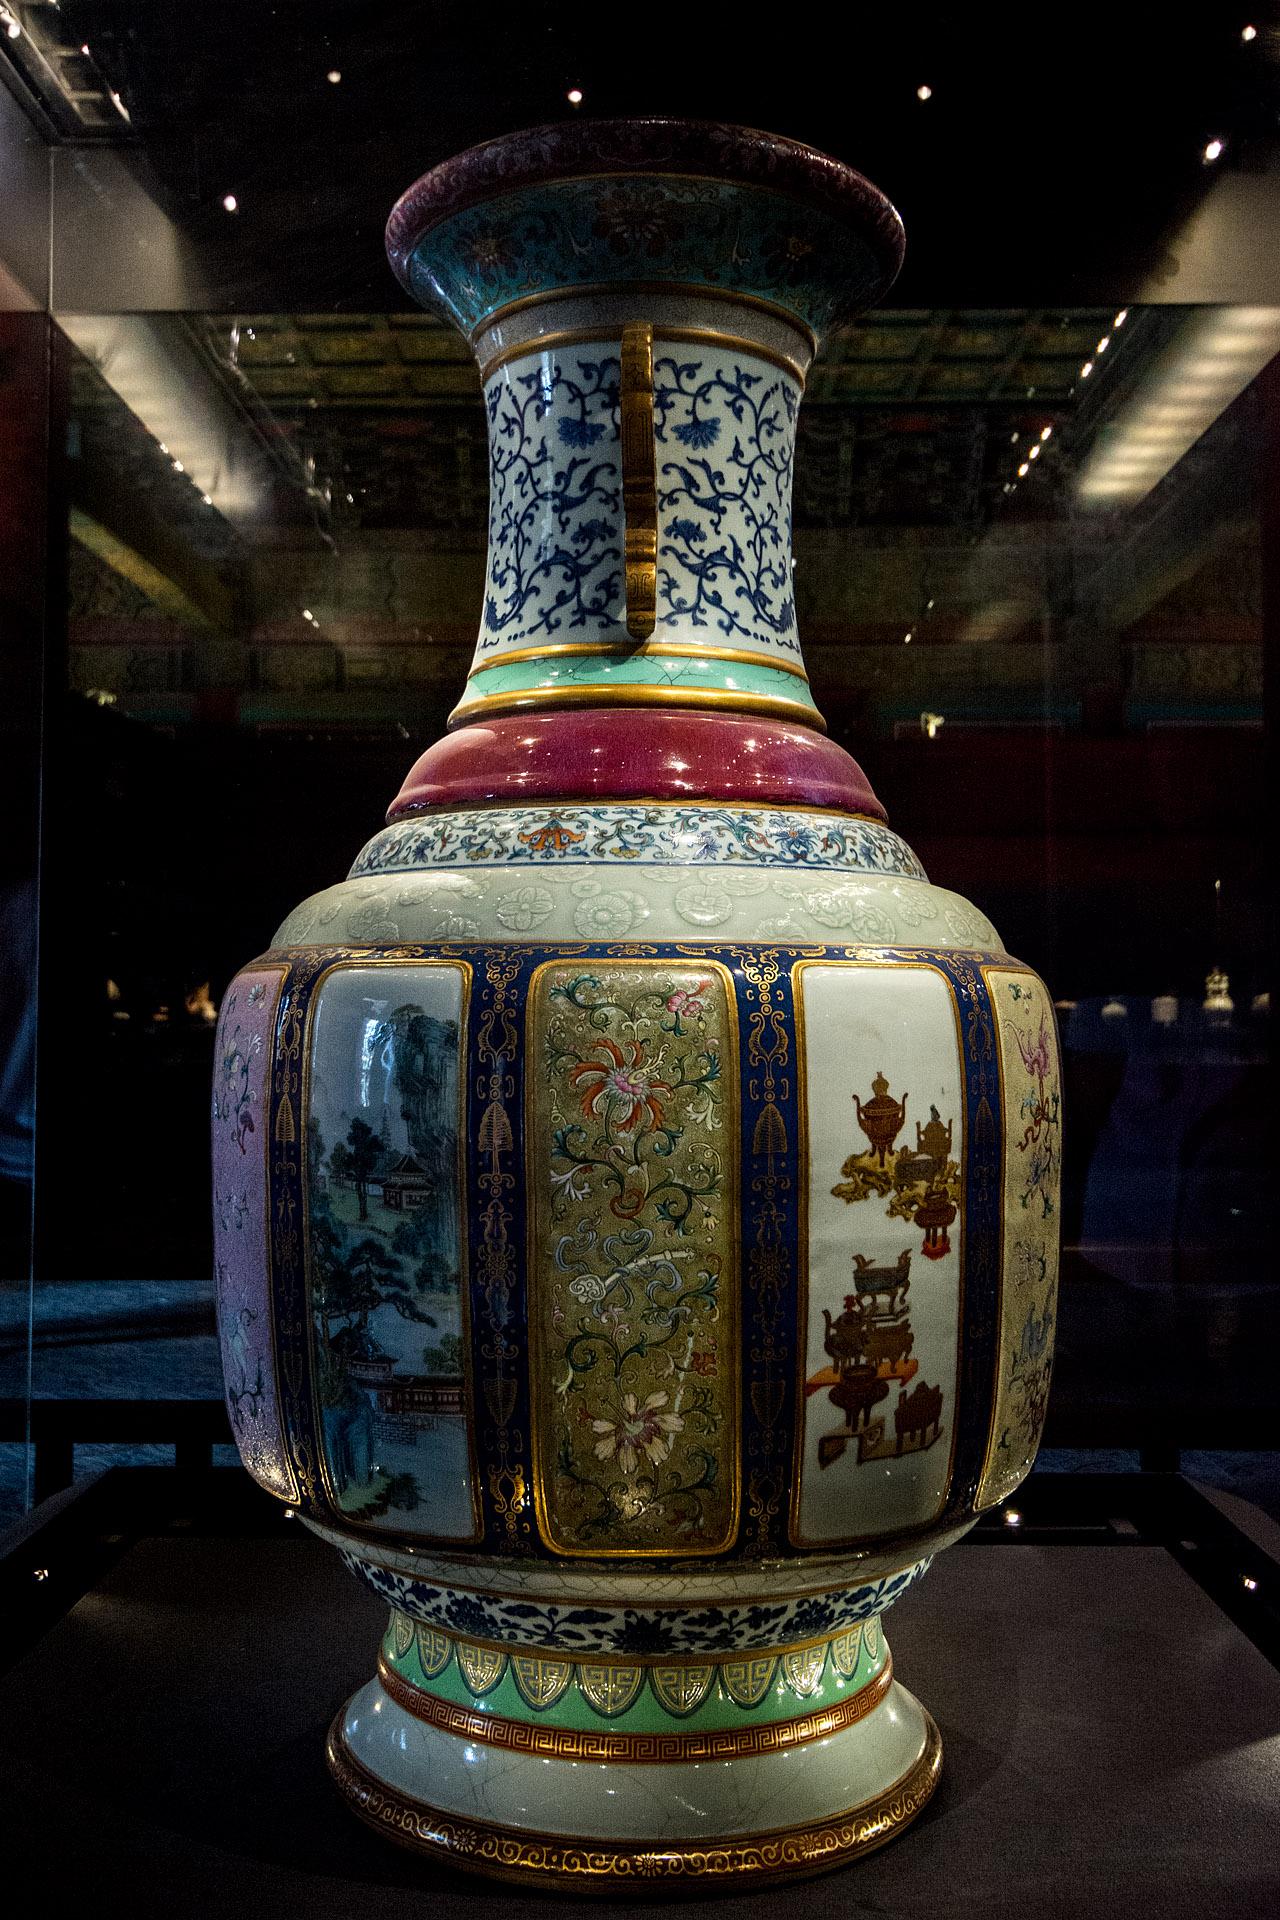 Qing Dynasty, Qianlong Emperor (1736 - 1795)